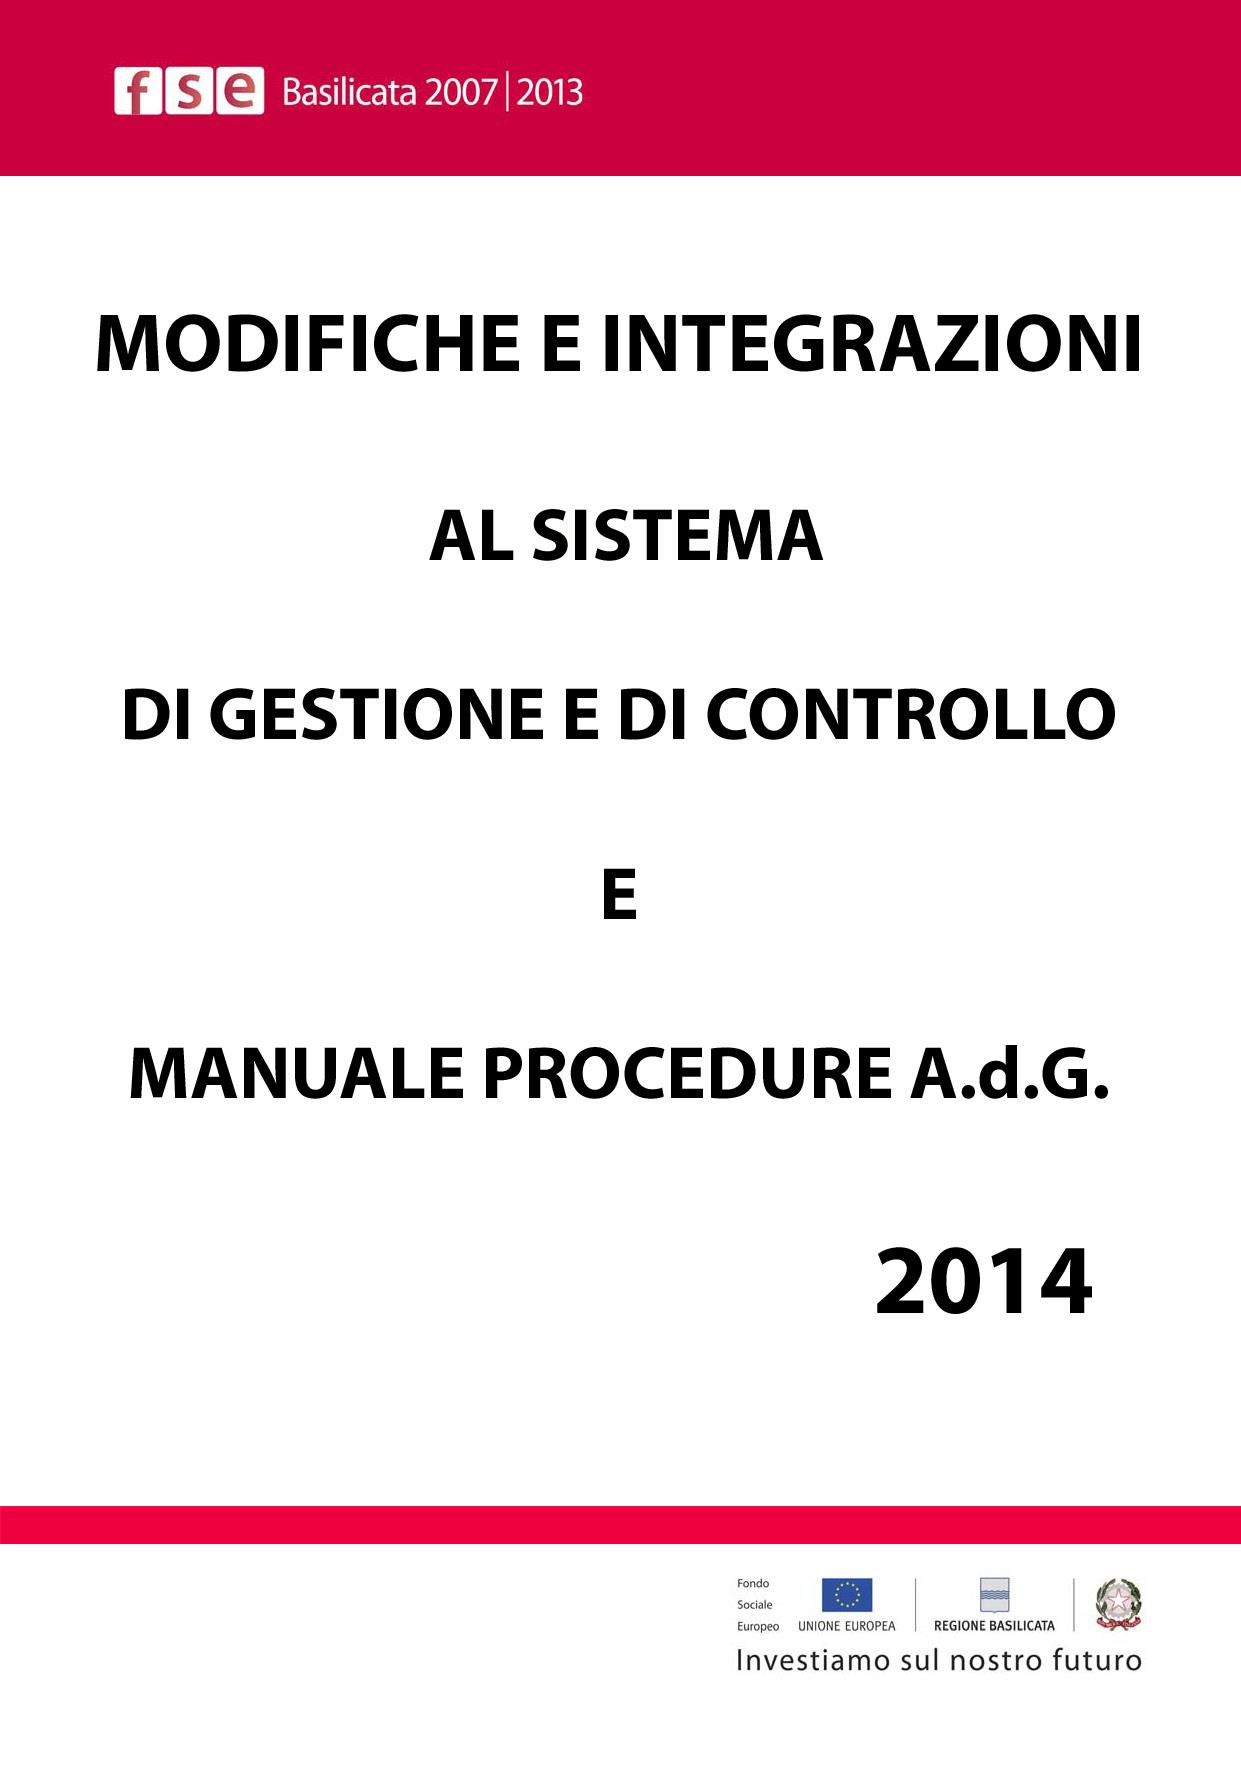 po fse manuali rh fse basilicata it 2007-2008 Kindergarten 2007-2008 Kindergarten